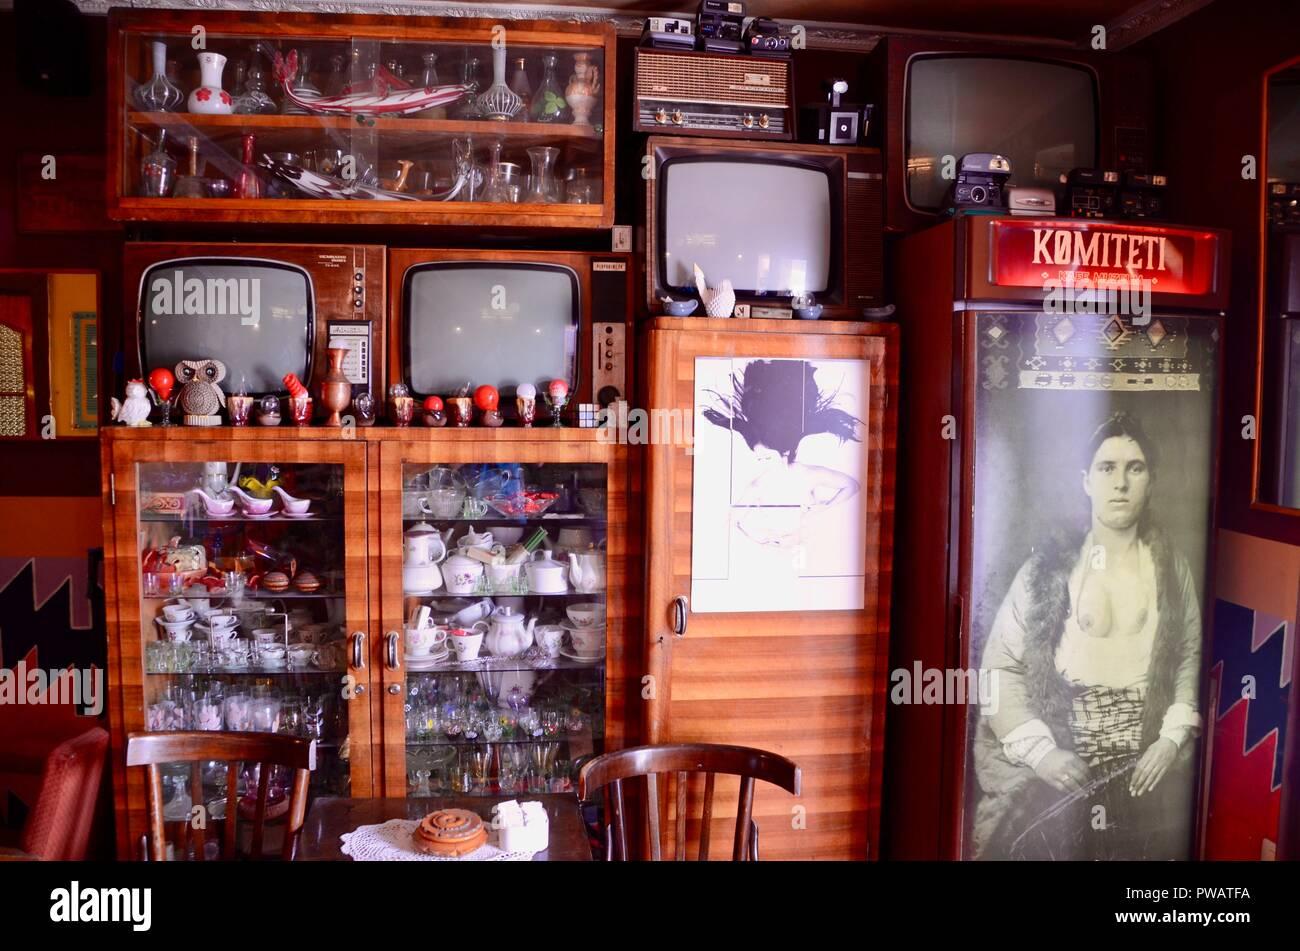 komiteti cafe tirana albania - Stock Image